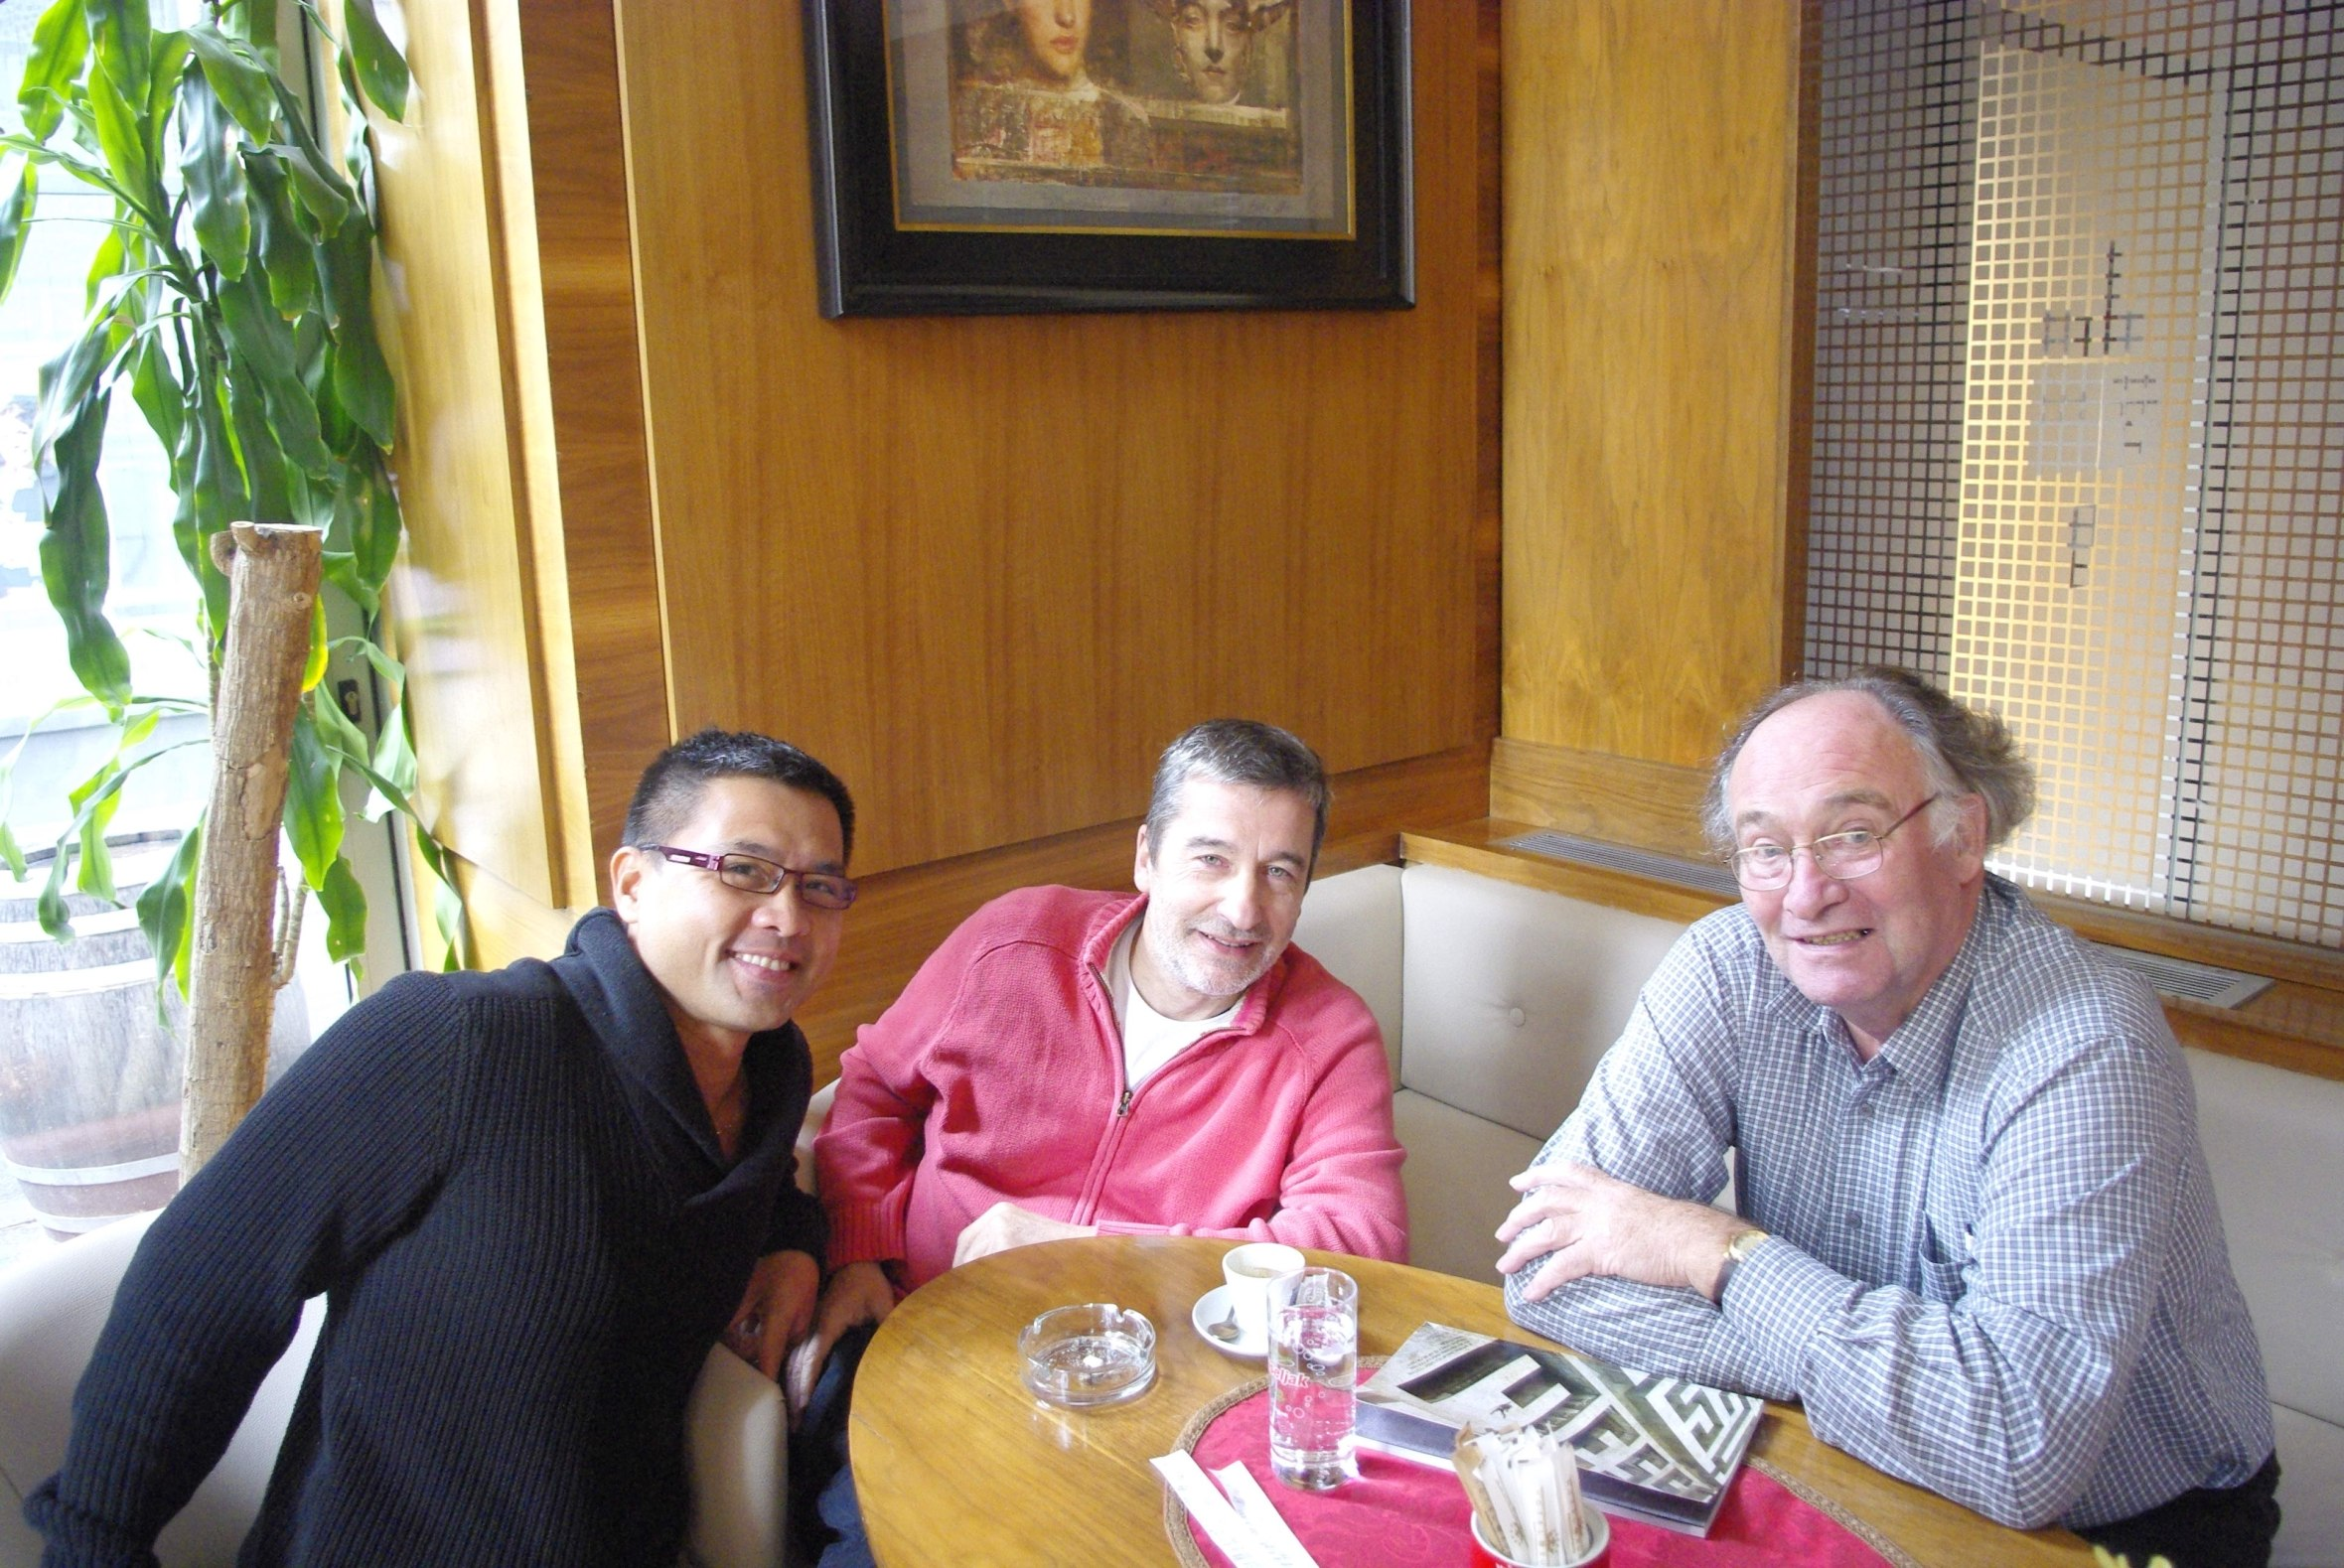 International critics Randy Gener (USA), Ian Herbert (UK) and Bojan Munjin (Croatia) deliberate in Sarajevo | Photo by Randy Gener